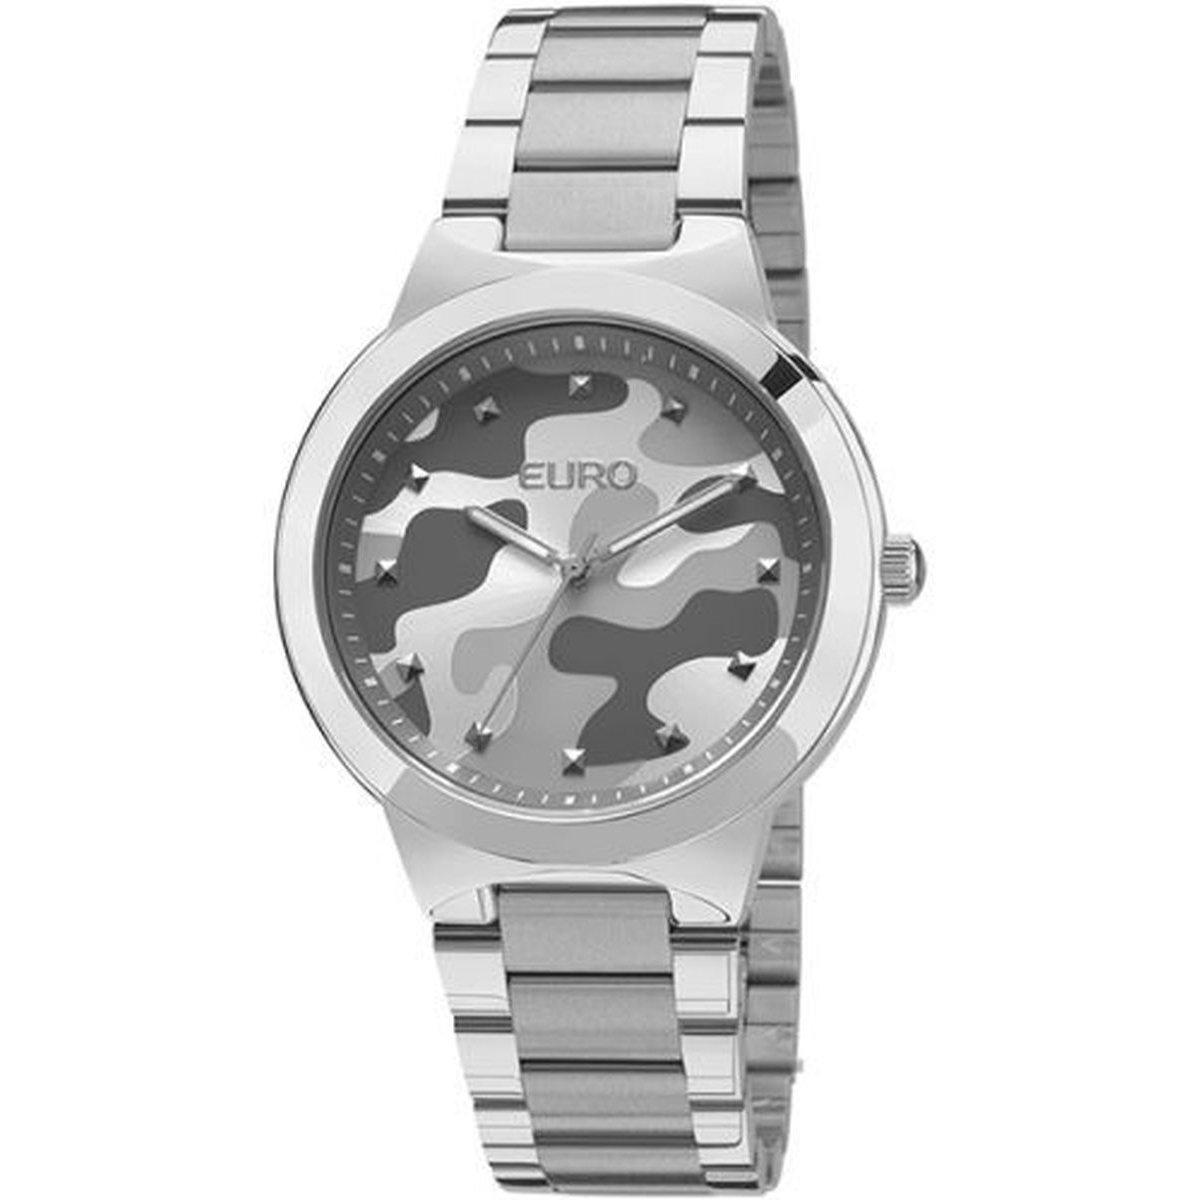 f605dfa7ac9 Relógio Euro Feminino Analogico Fashion - Compre Agora